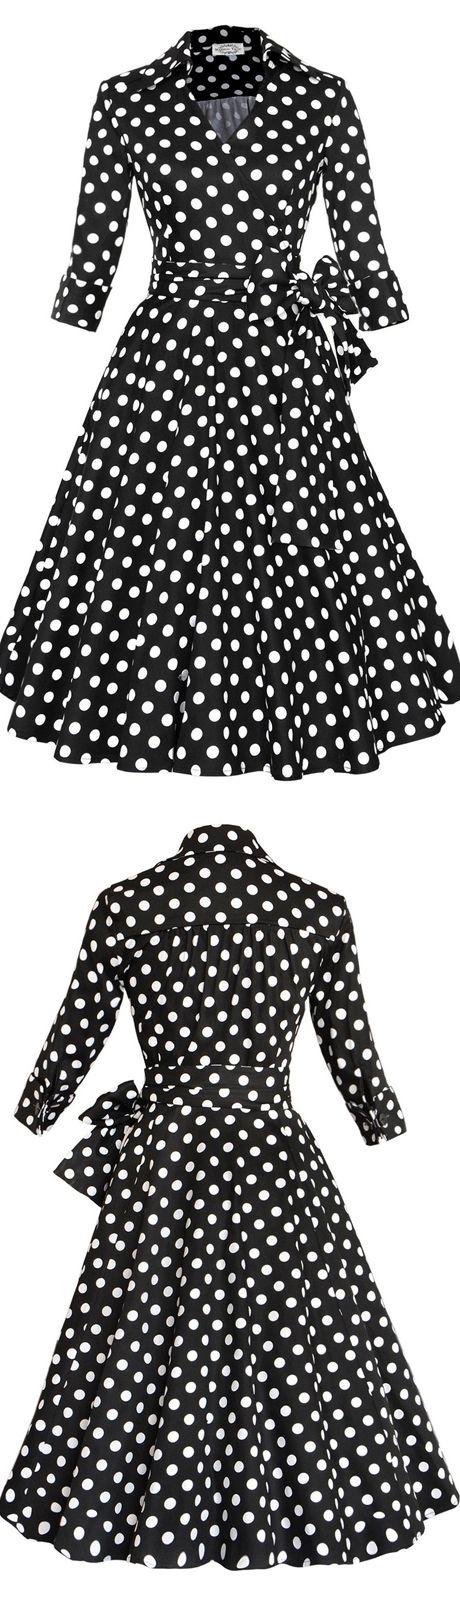 Black Lapel Polka Dots Swing Party Vintage Dress with Sleeves vintage,vintage style dress,vintage fashion,50s,50s dress,black dress,polka dots,50s fashion